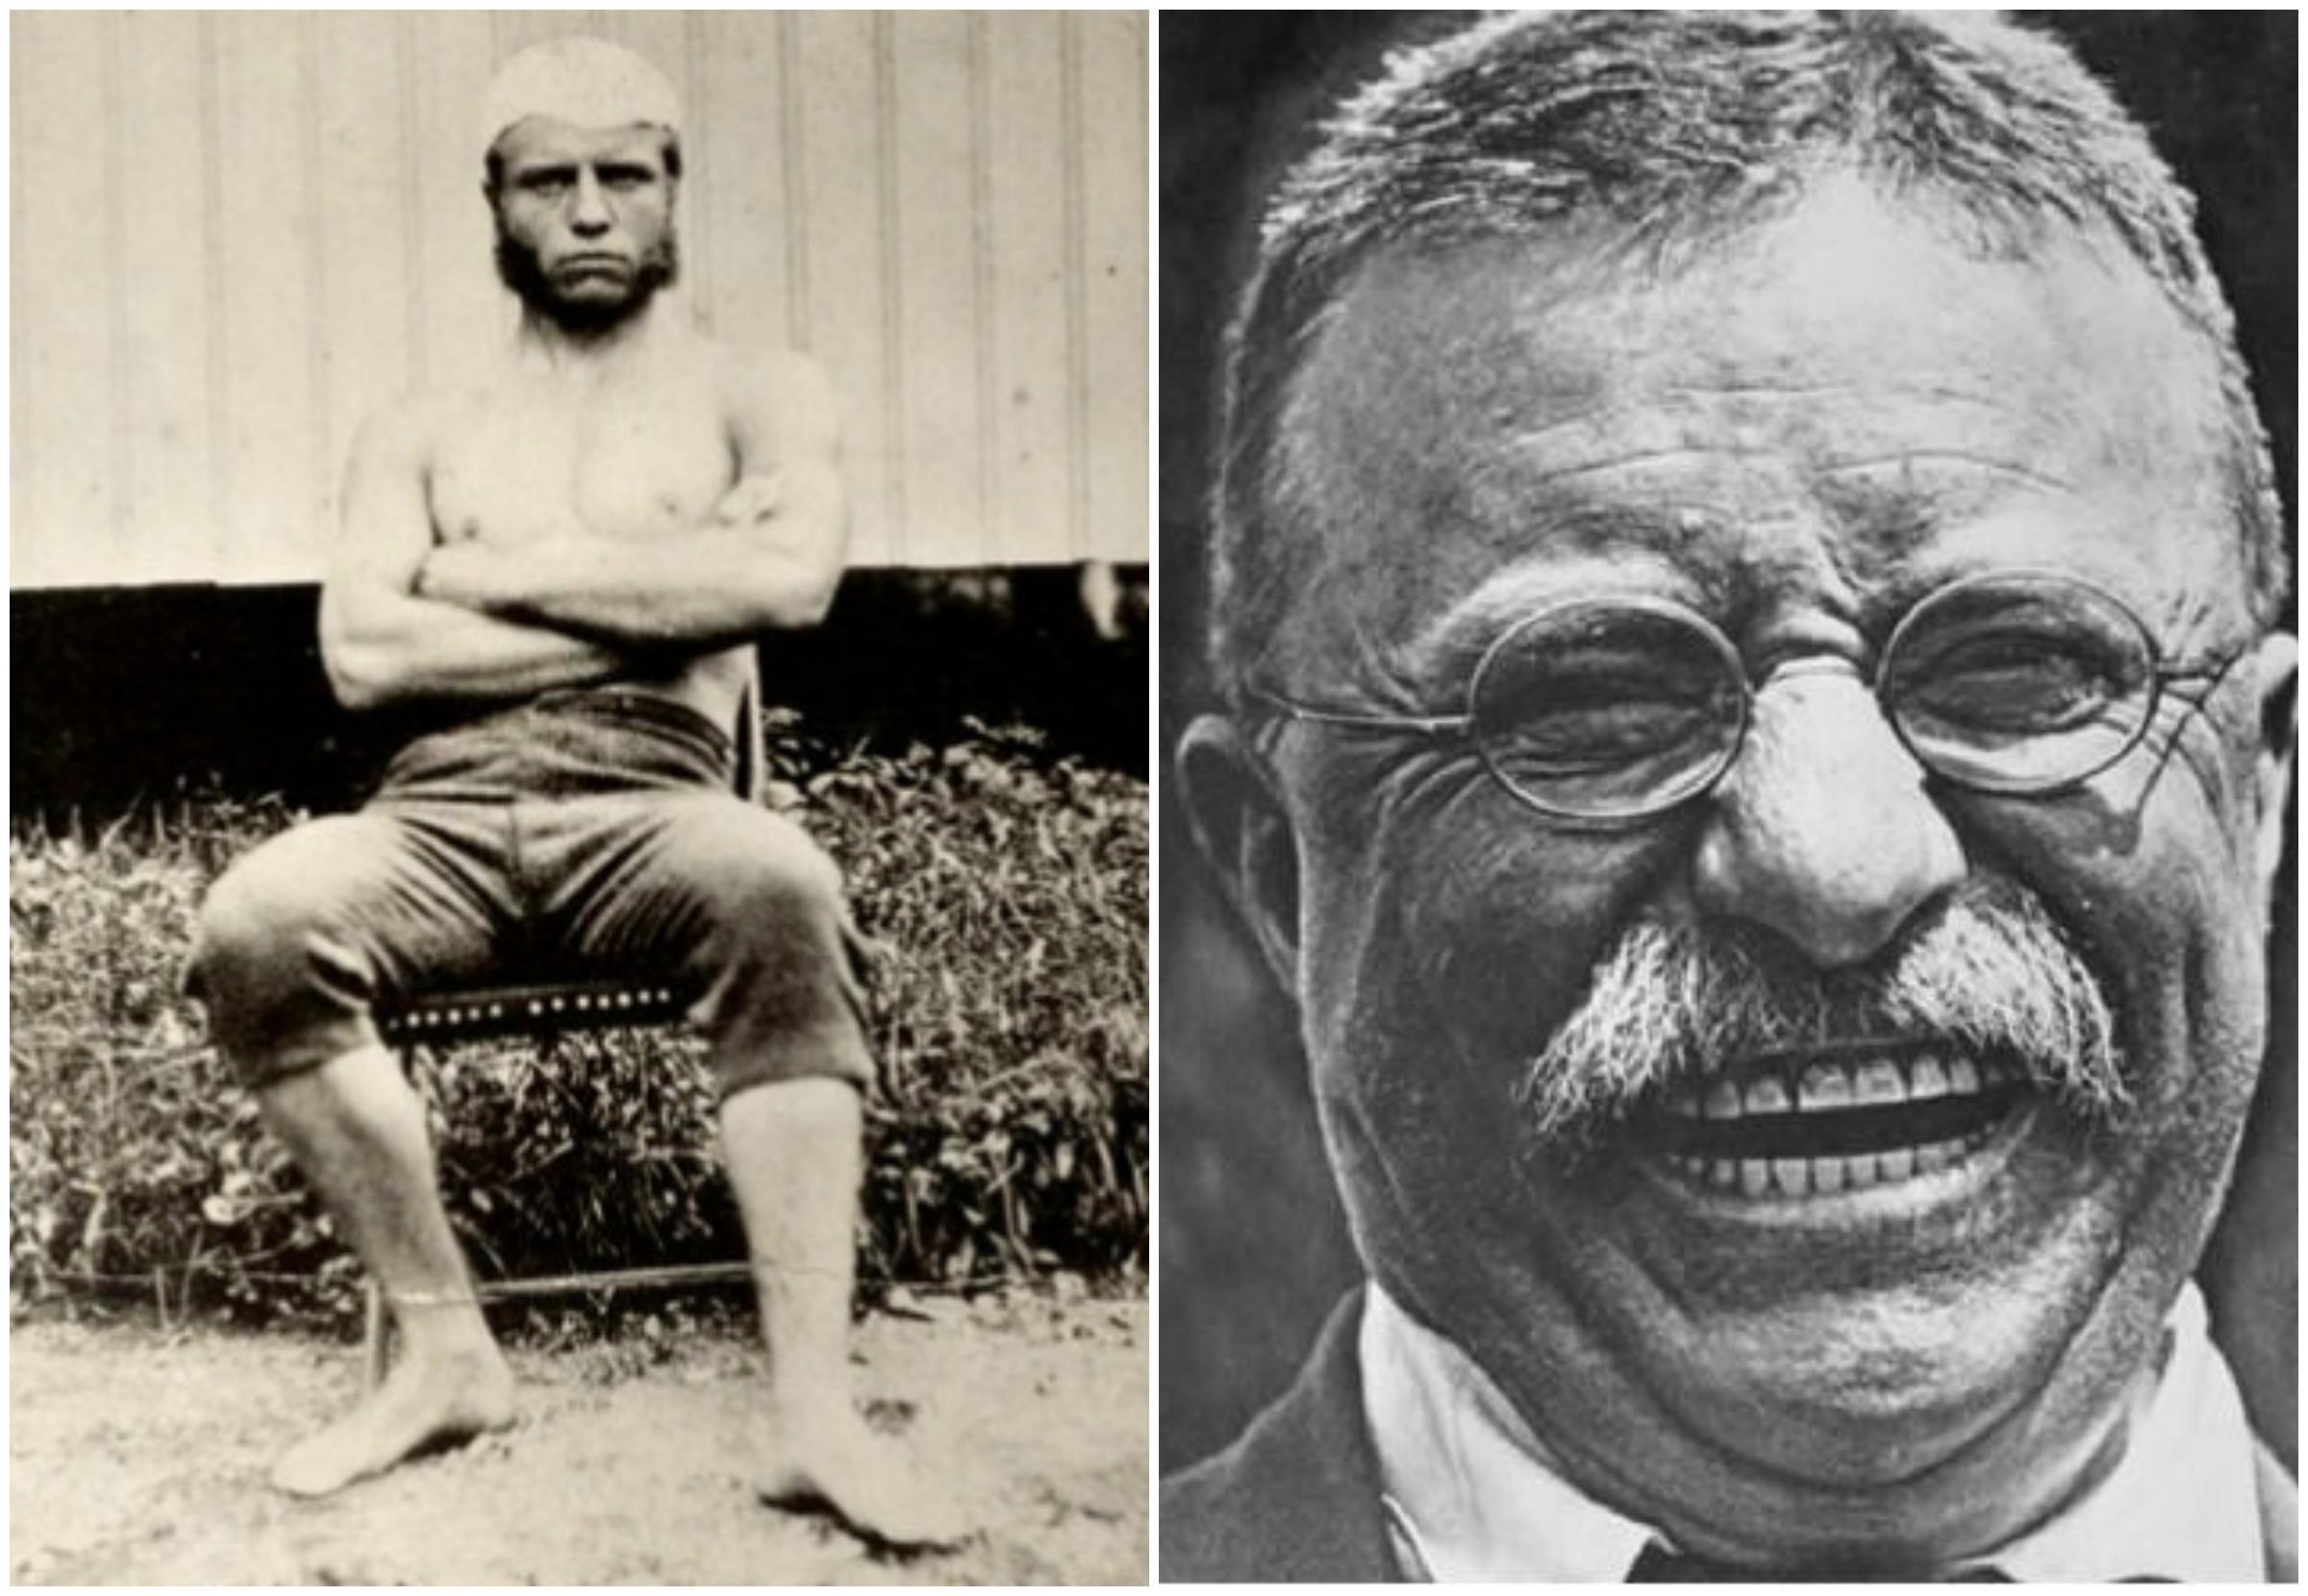 US President Teddy Roosevelt Trained Jiu-Jitsu & Judo